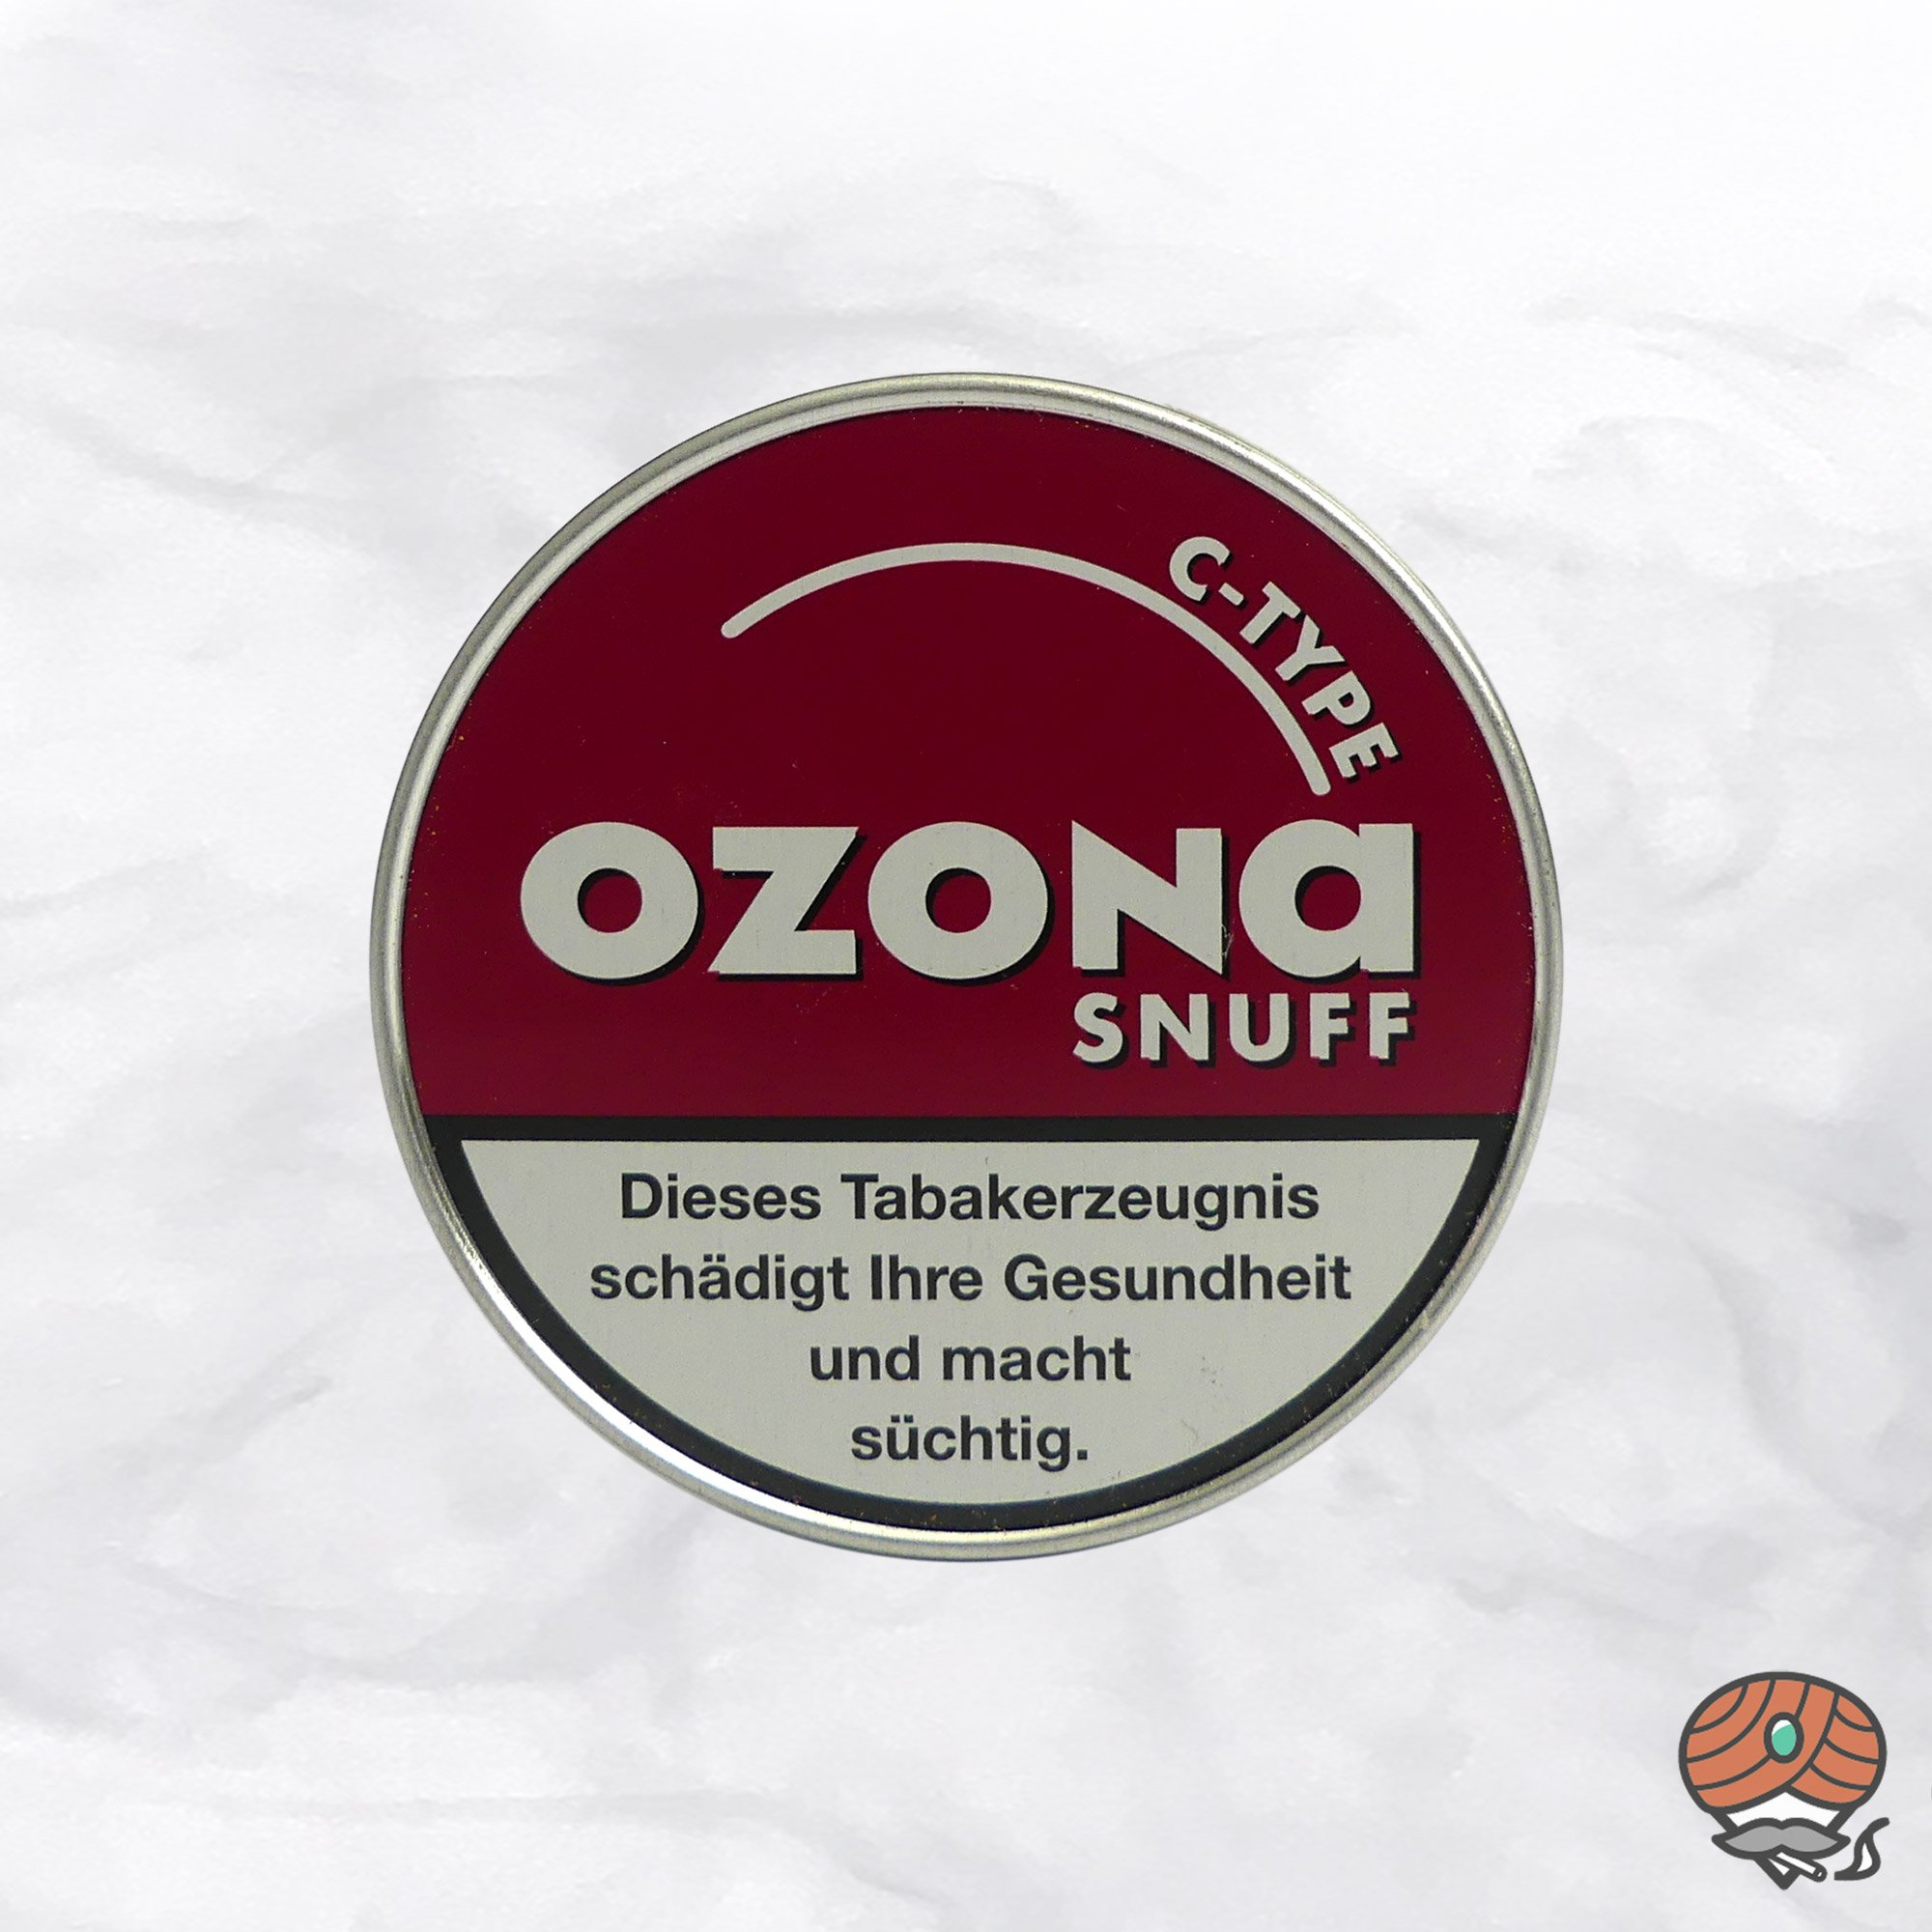 Ozona C-TYPE Snuff Schnupftabak 5g - Kirsche